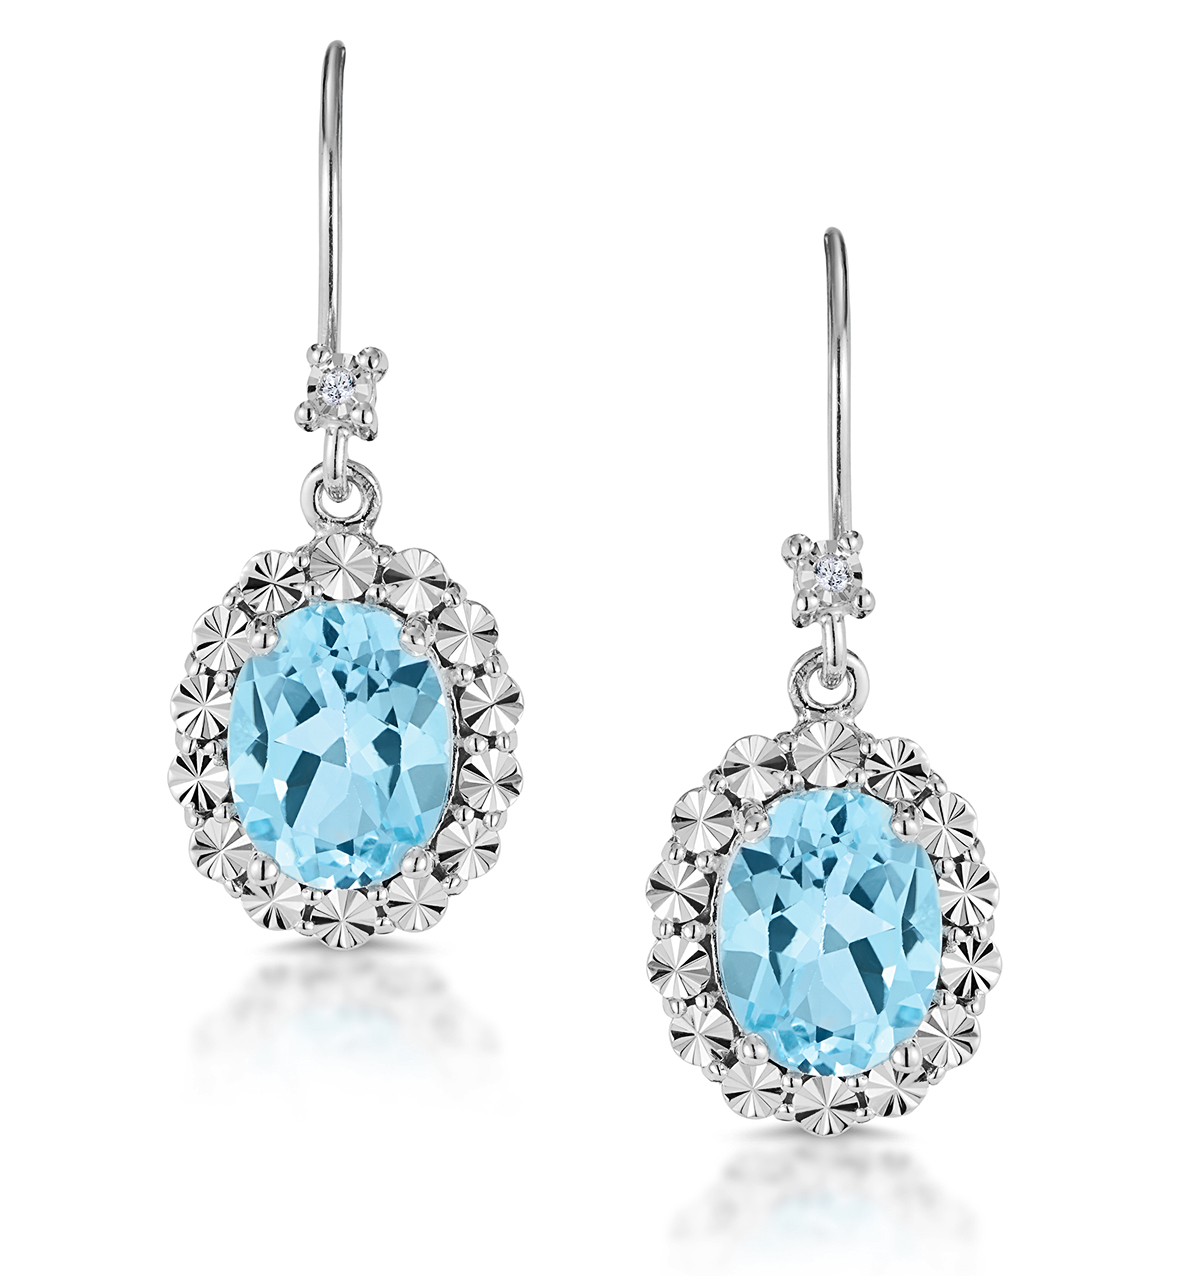 DIAMOND AND SILVER BLUE TOPAZ DANGLE EARRINGS - TESORO COLLECTION